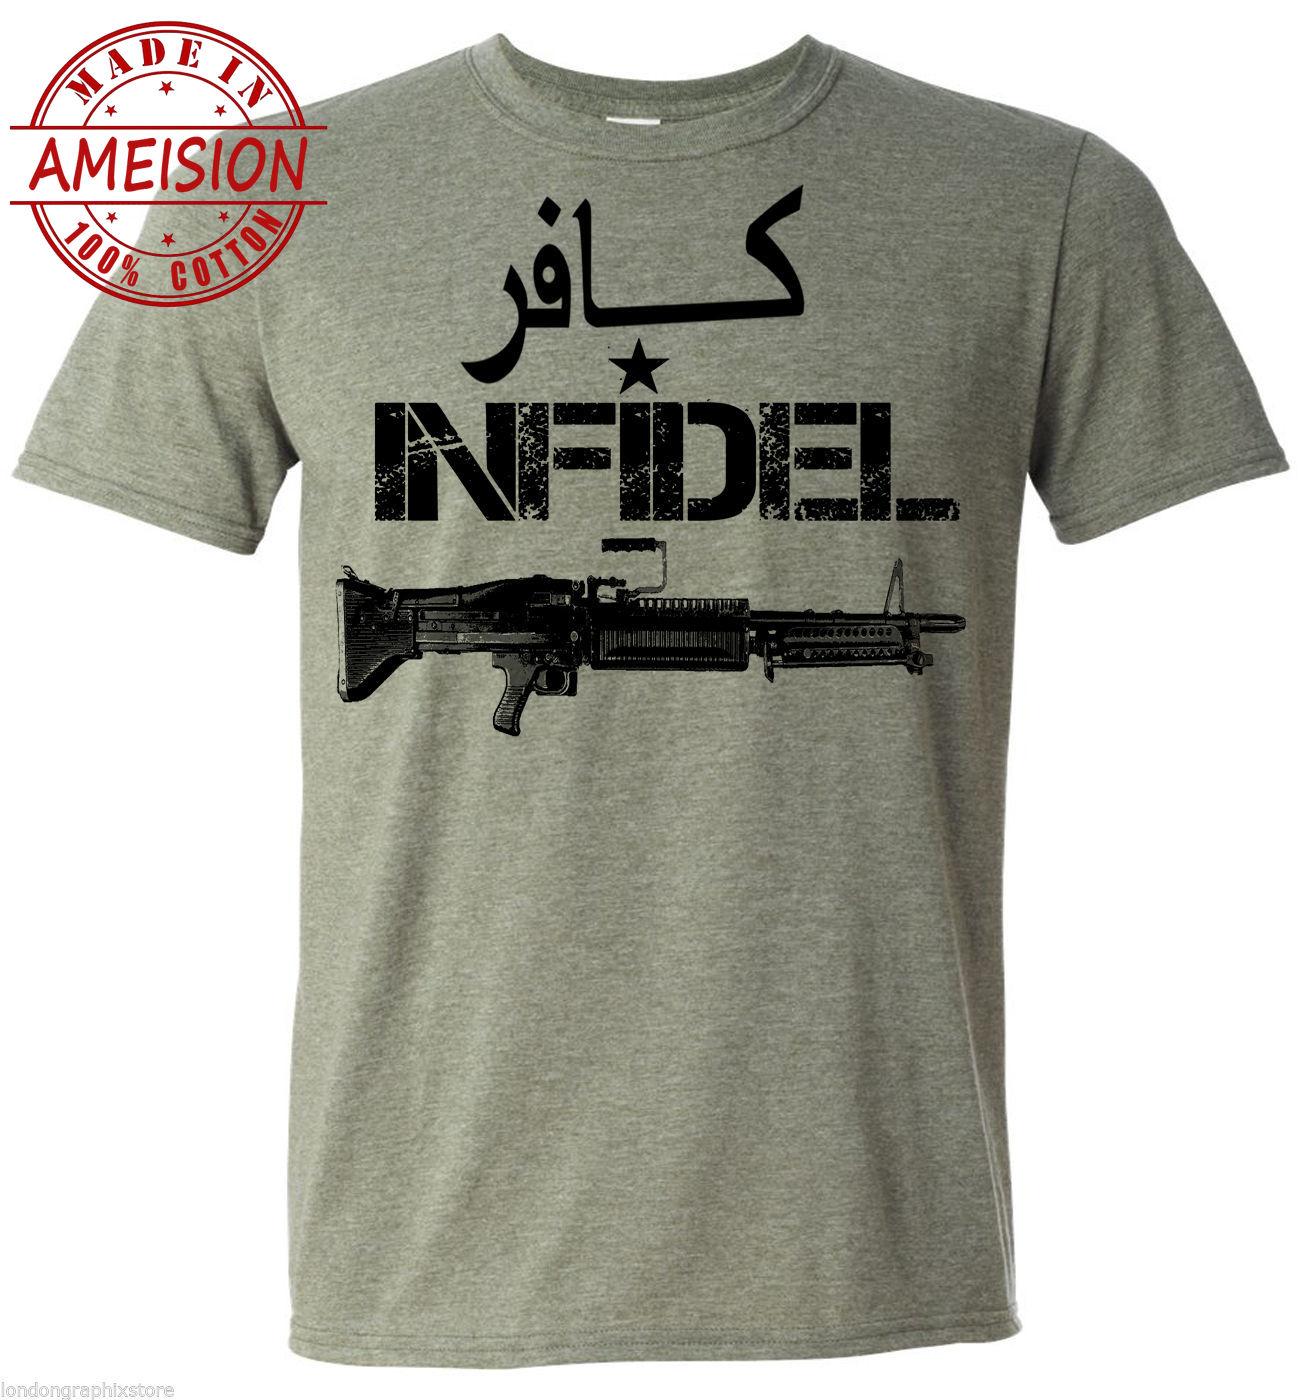 Nueva camiseta militar de moda para hombre de verano 2019, camiseta USMC, ejército, veteranos, guerra de Iraq, camiseta de Afghanistan